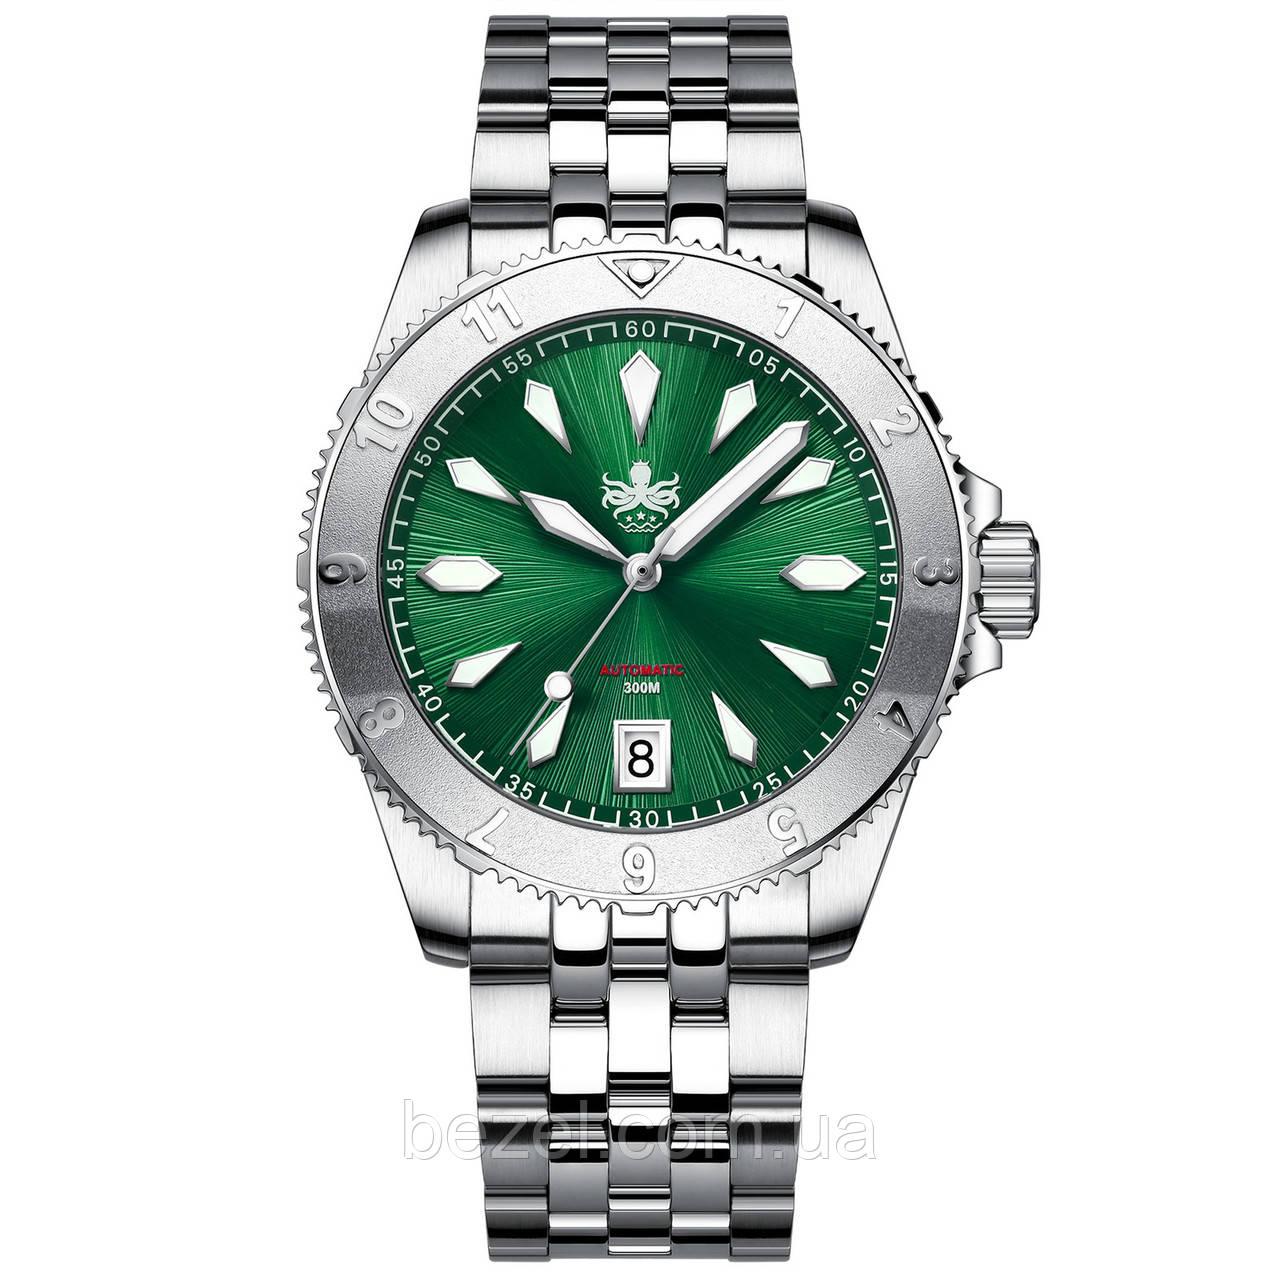 Чоловічі годинники PHOIBOS Voyager 300M Automatic Diver PY026A Green